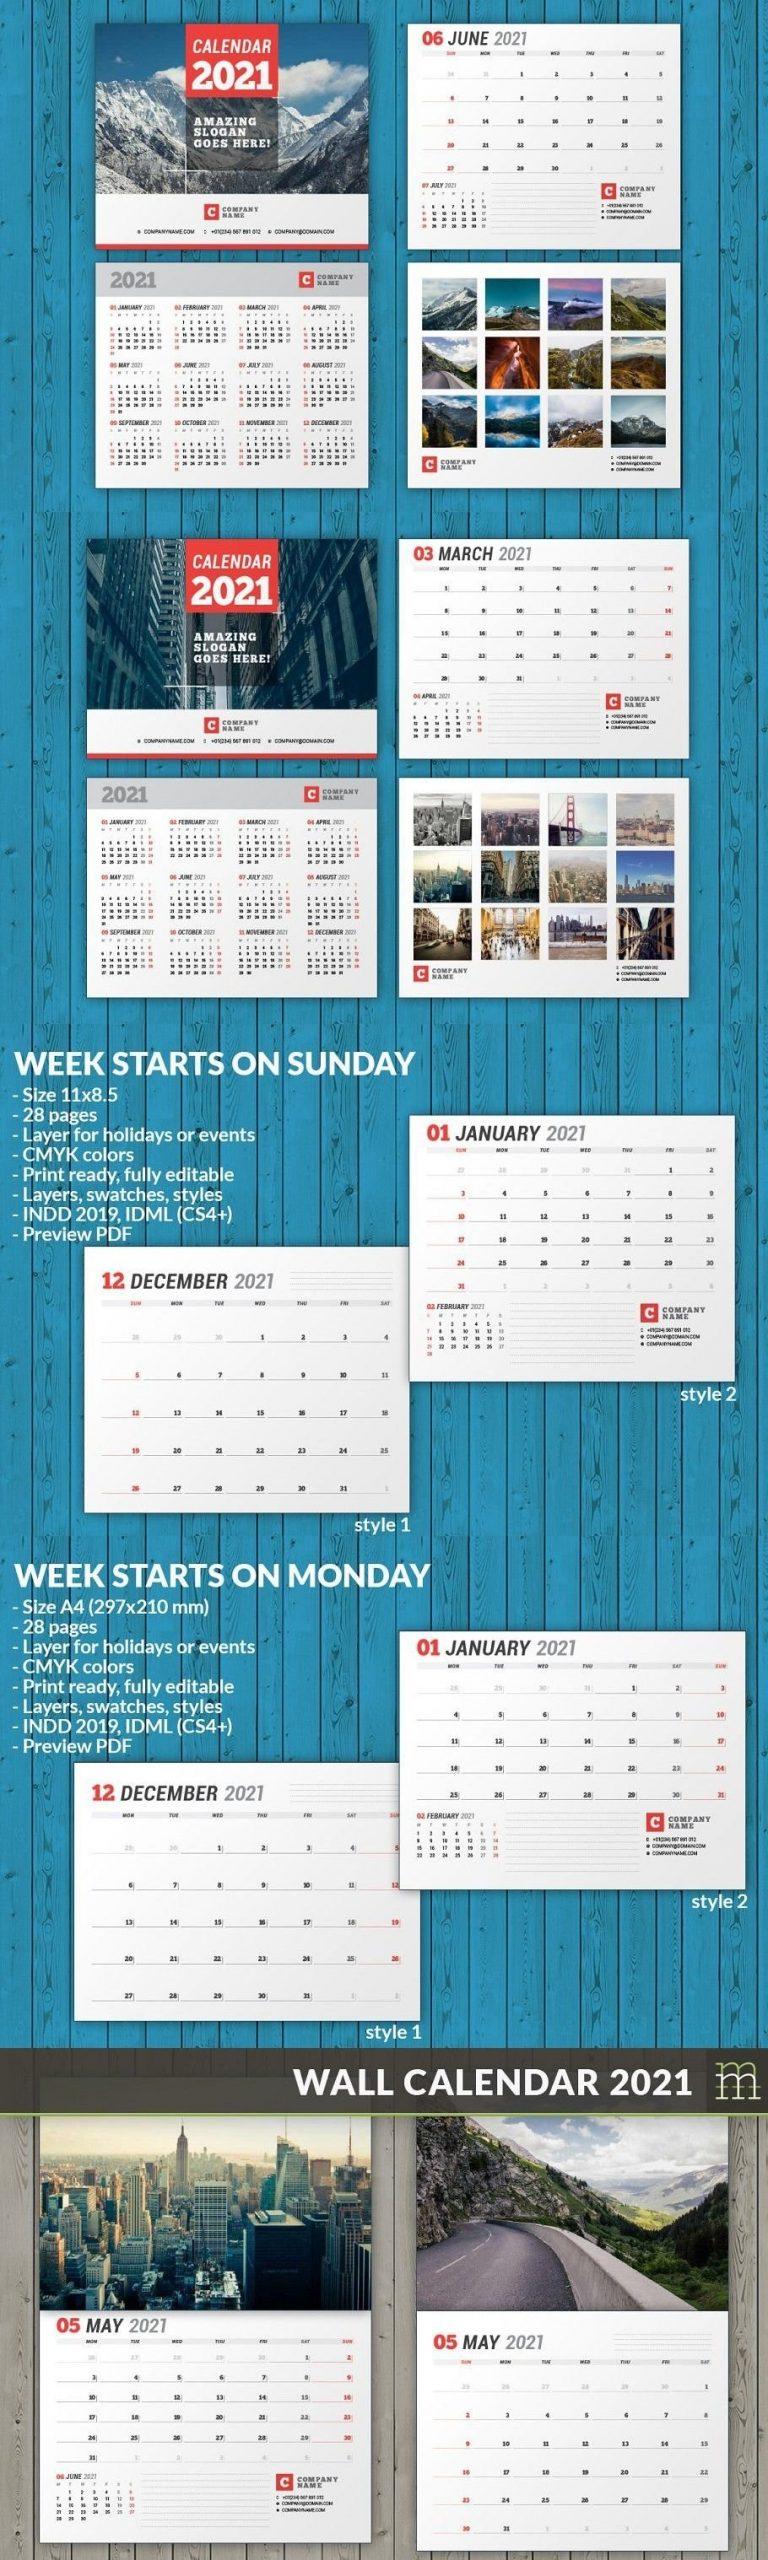 Wall Calendar 2021 (Wc037-21) In 2020 | Wall Calendar, Calendar Template, Calendar 2020 within Indesign Calendar Templates 2021